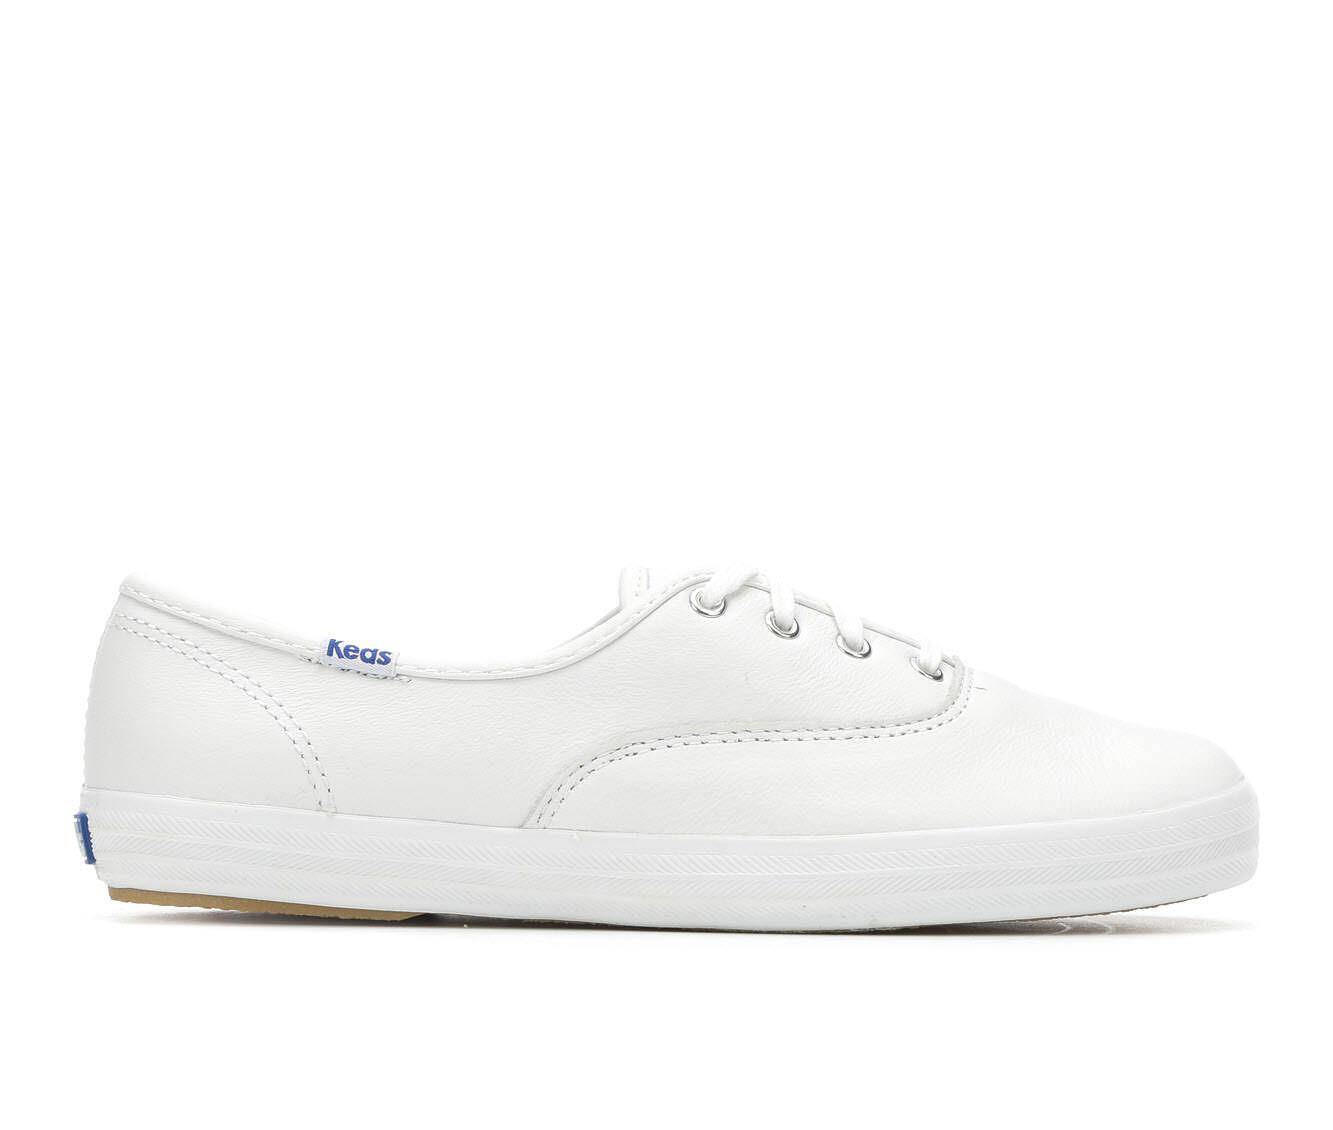 Keds Champion Women's Leather ... Oxford Shoes U97pVJn4j